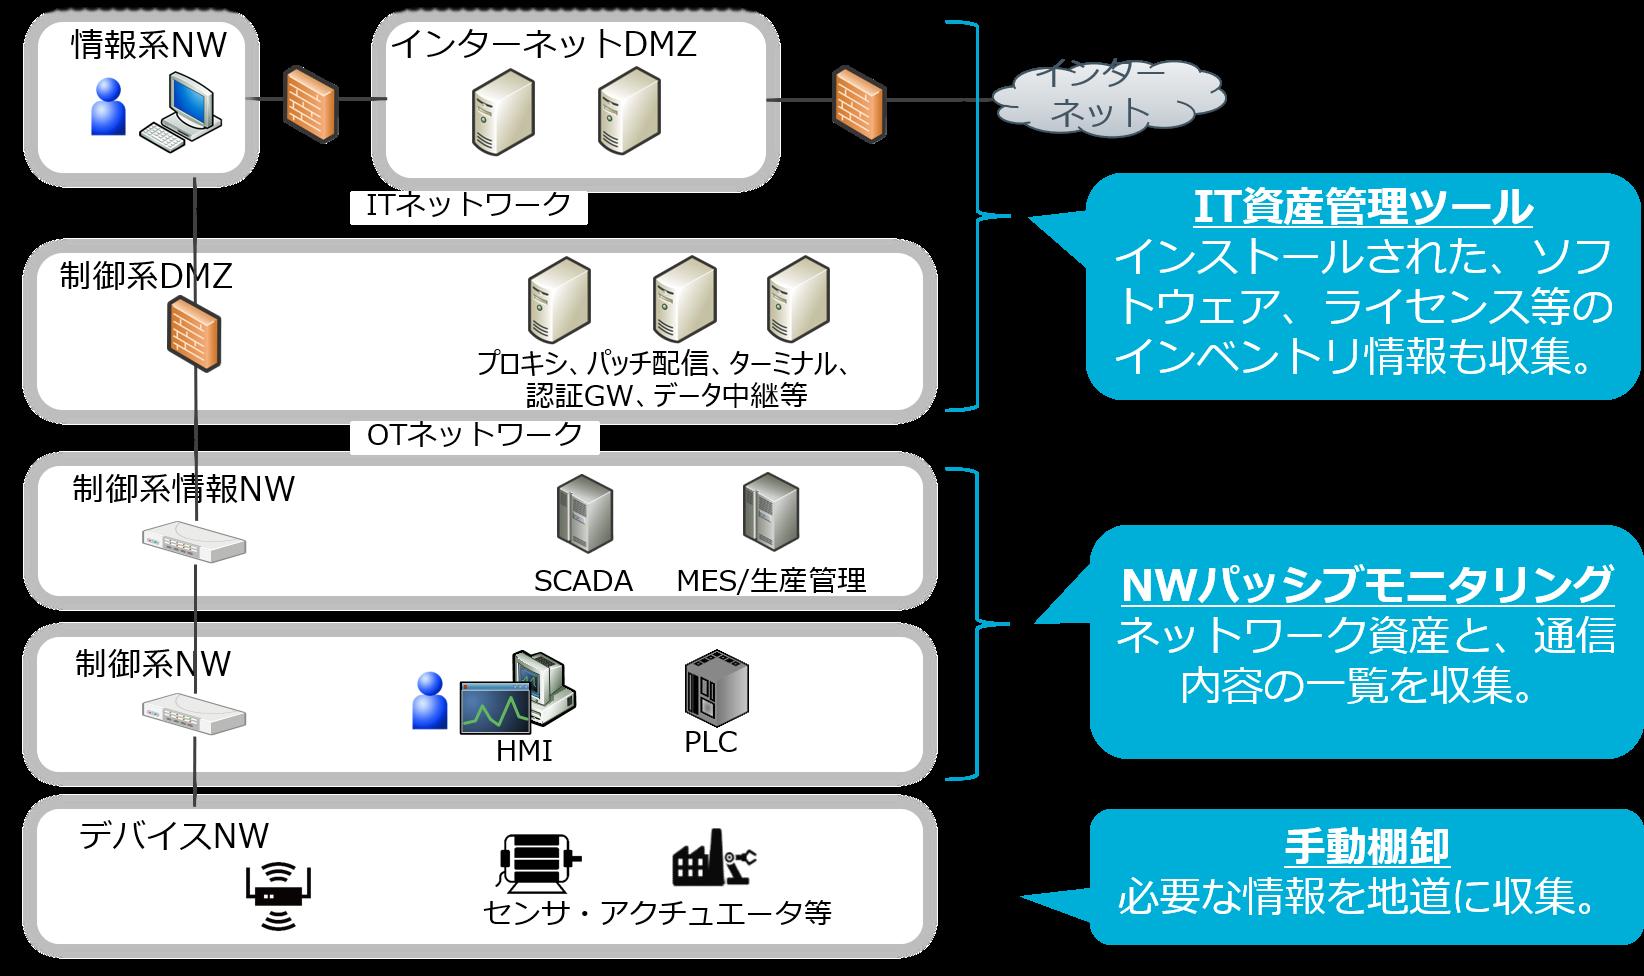 Secure SketCH_ネットワークごとの構成情報把握手法